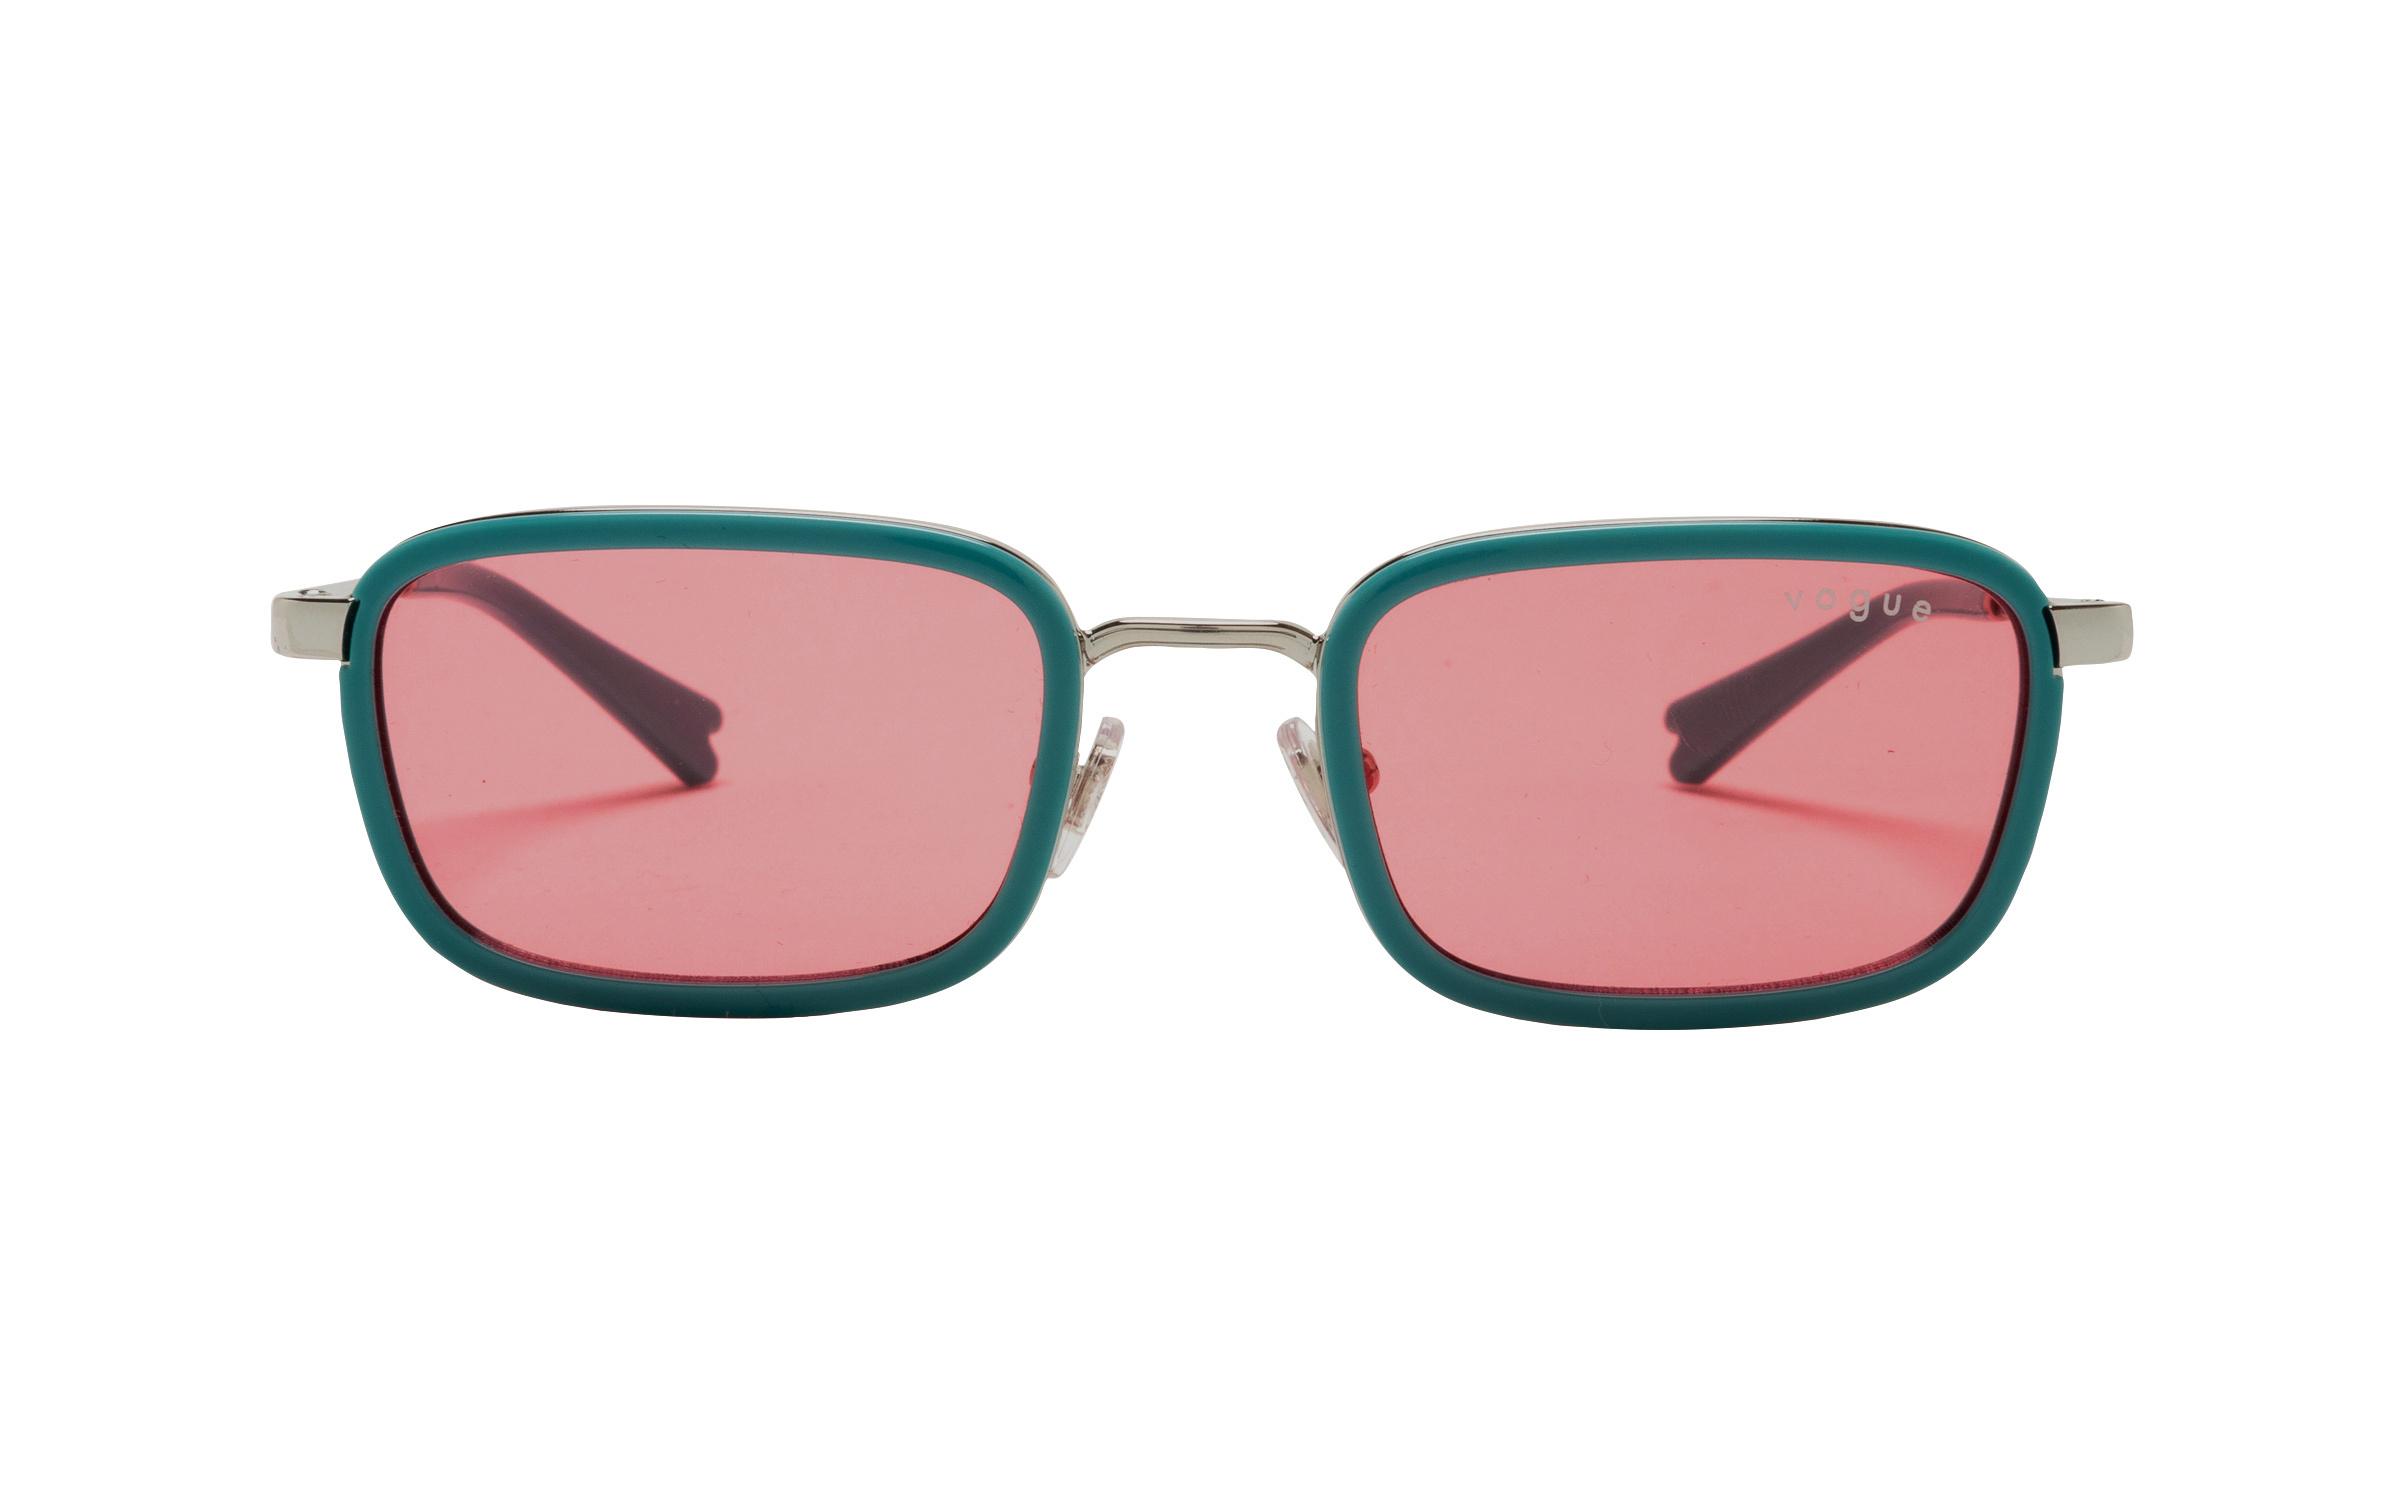 coastal.com - Vogue VO4166S 512284 47 Sunglasses in Silver Green | Metal – Online Coastal 111.00 USD